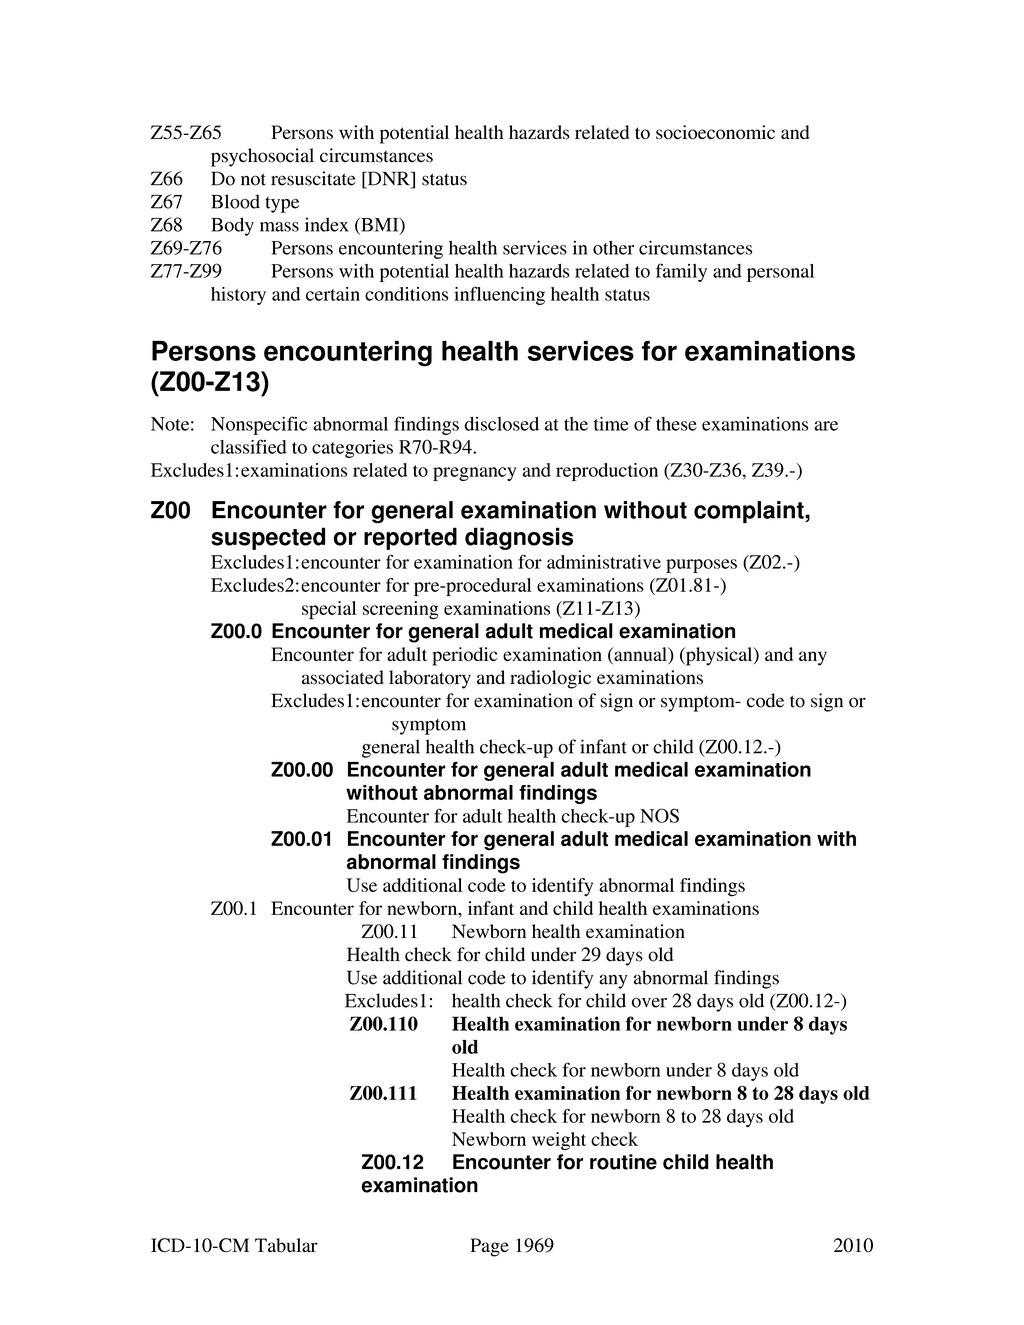 Cukorbetegség: ICD kód 10